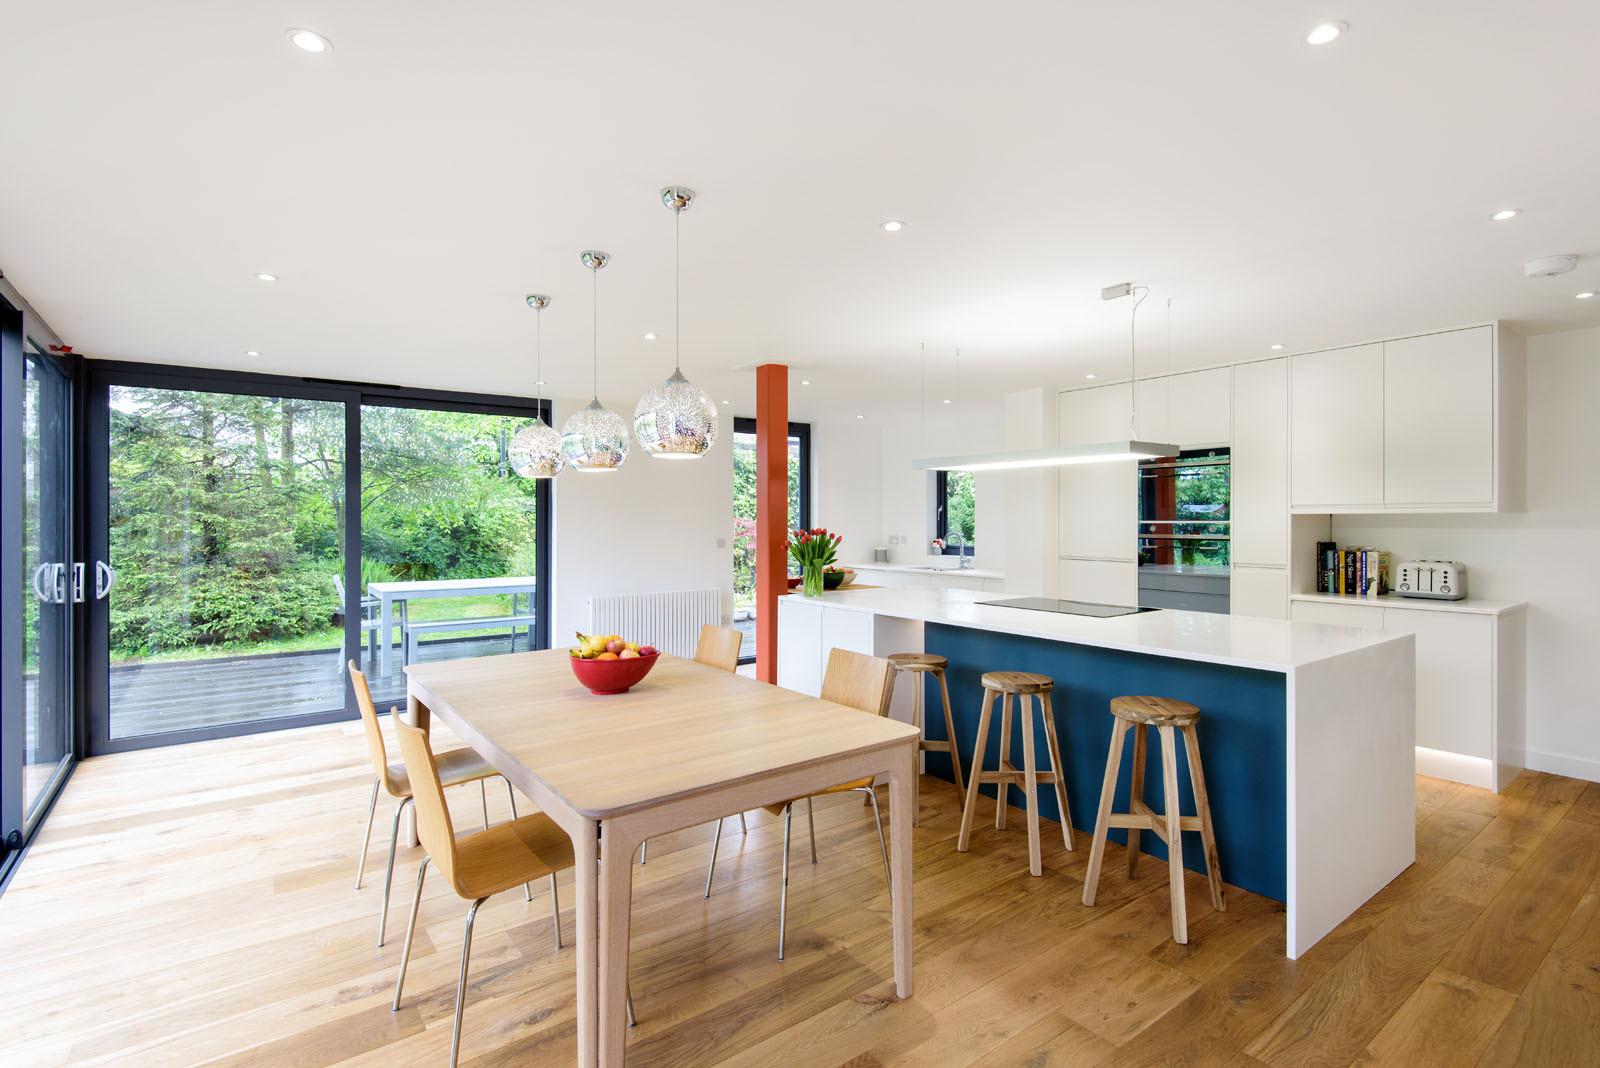 Baronswood-extension-kitchen-Jill-Tate-0